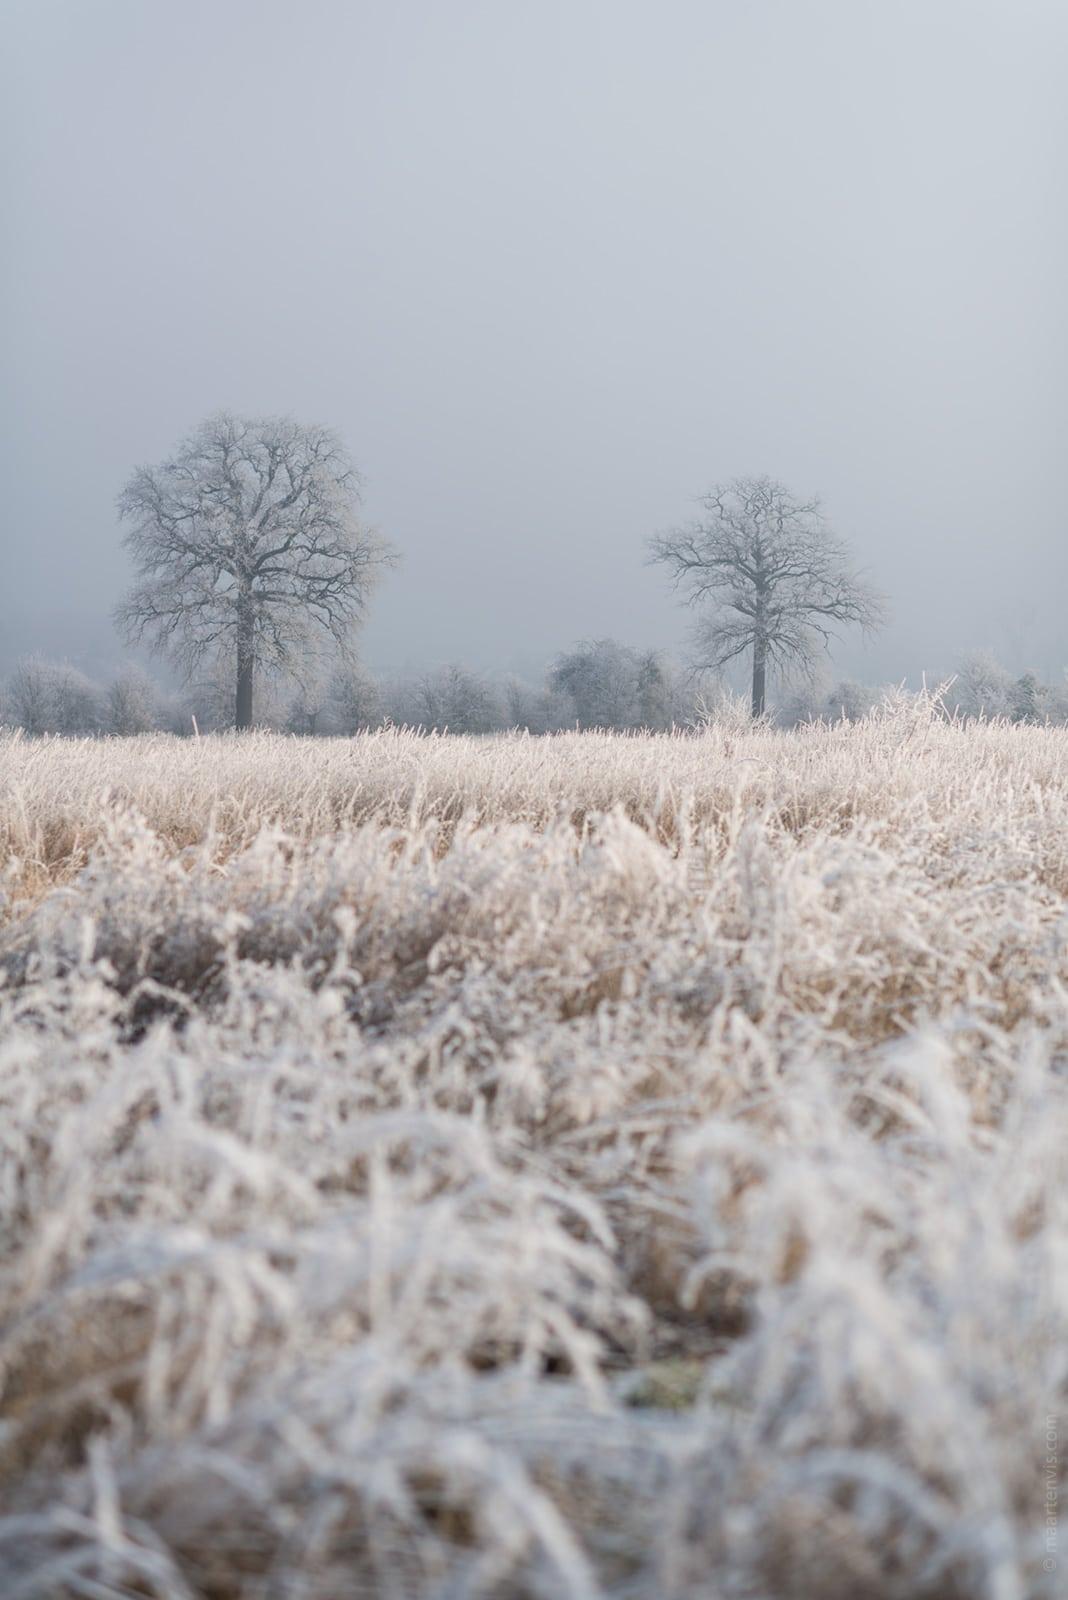 20161231 7292 - Winter in Limburg